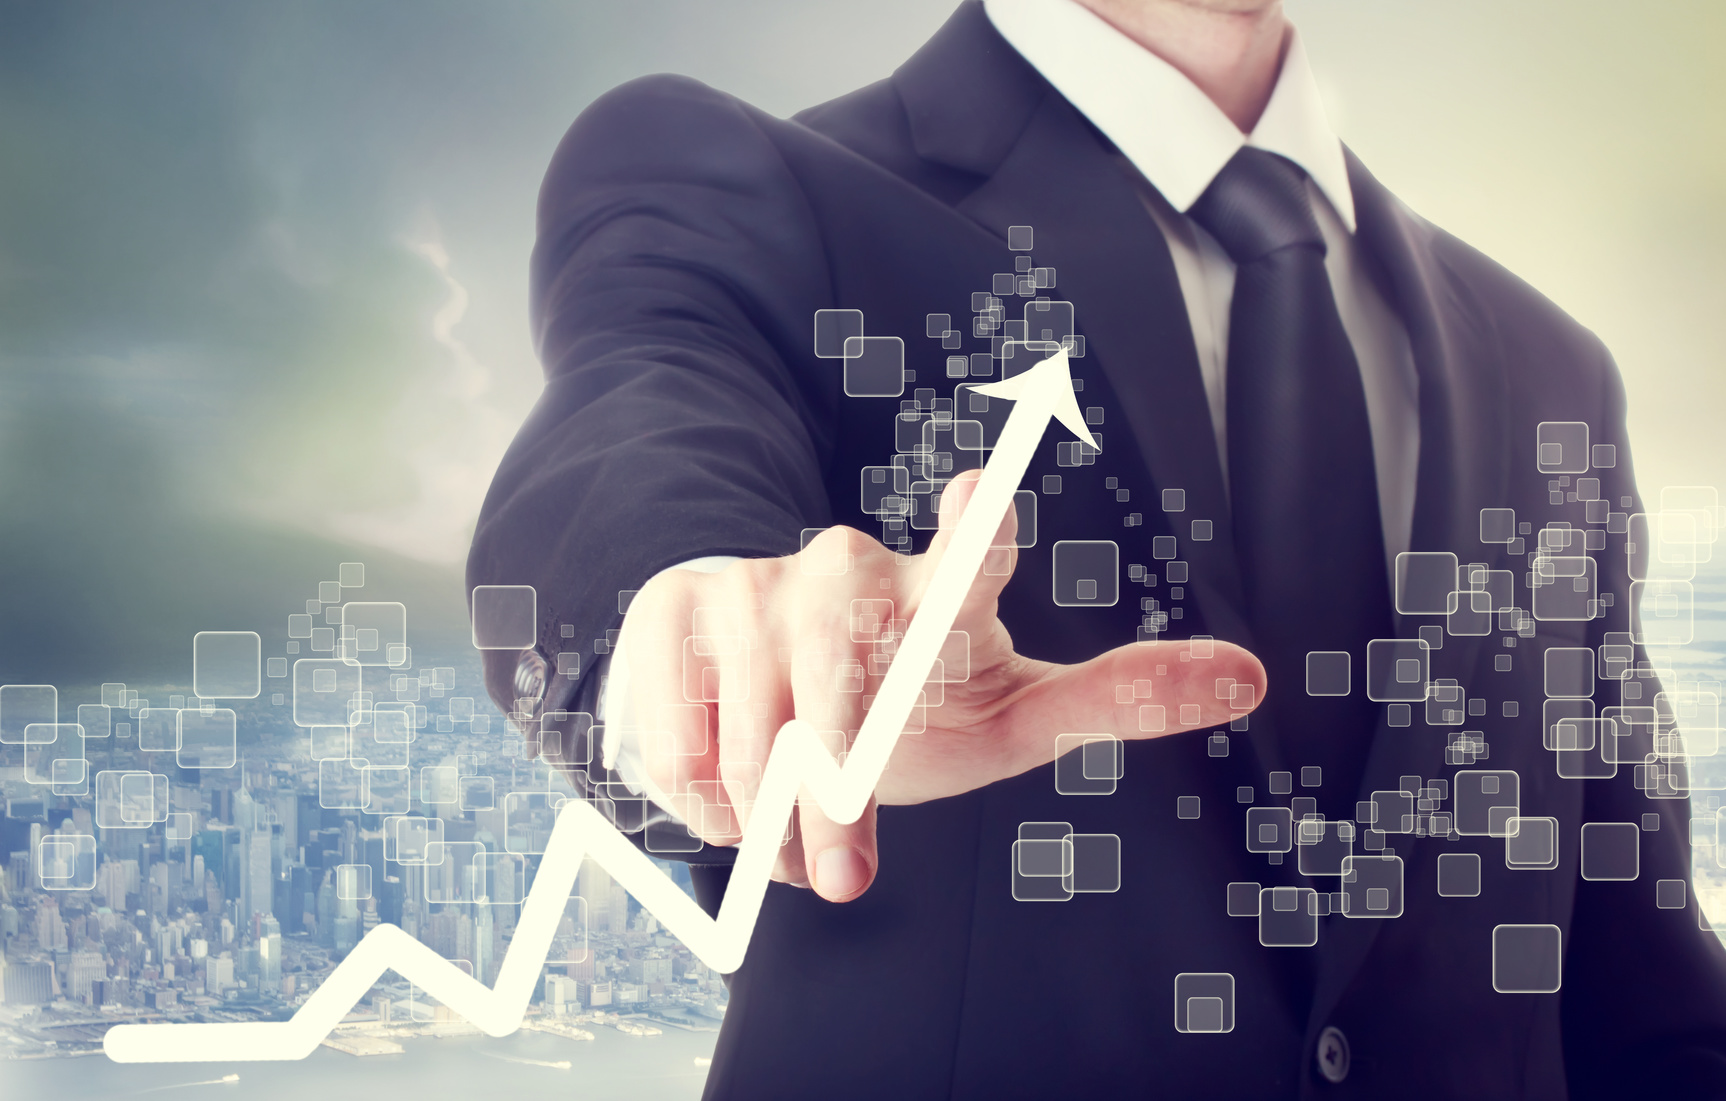 Business on small business, sole proprietorship,